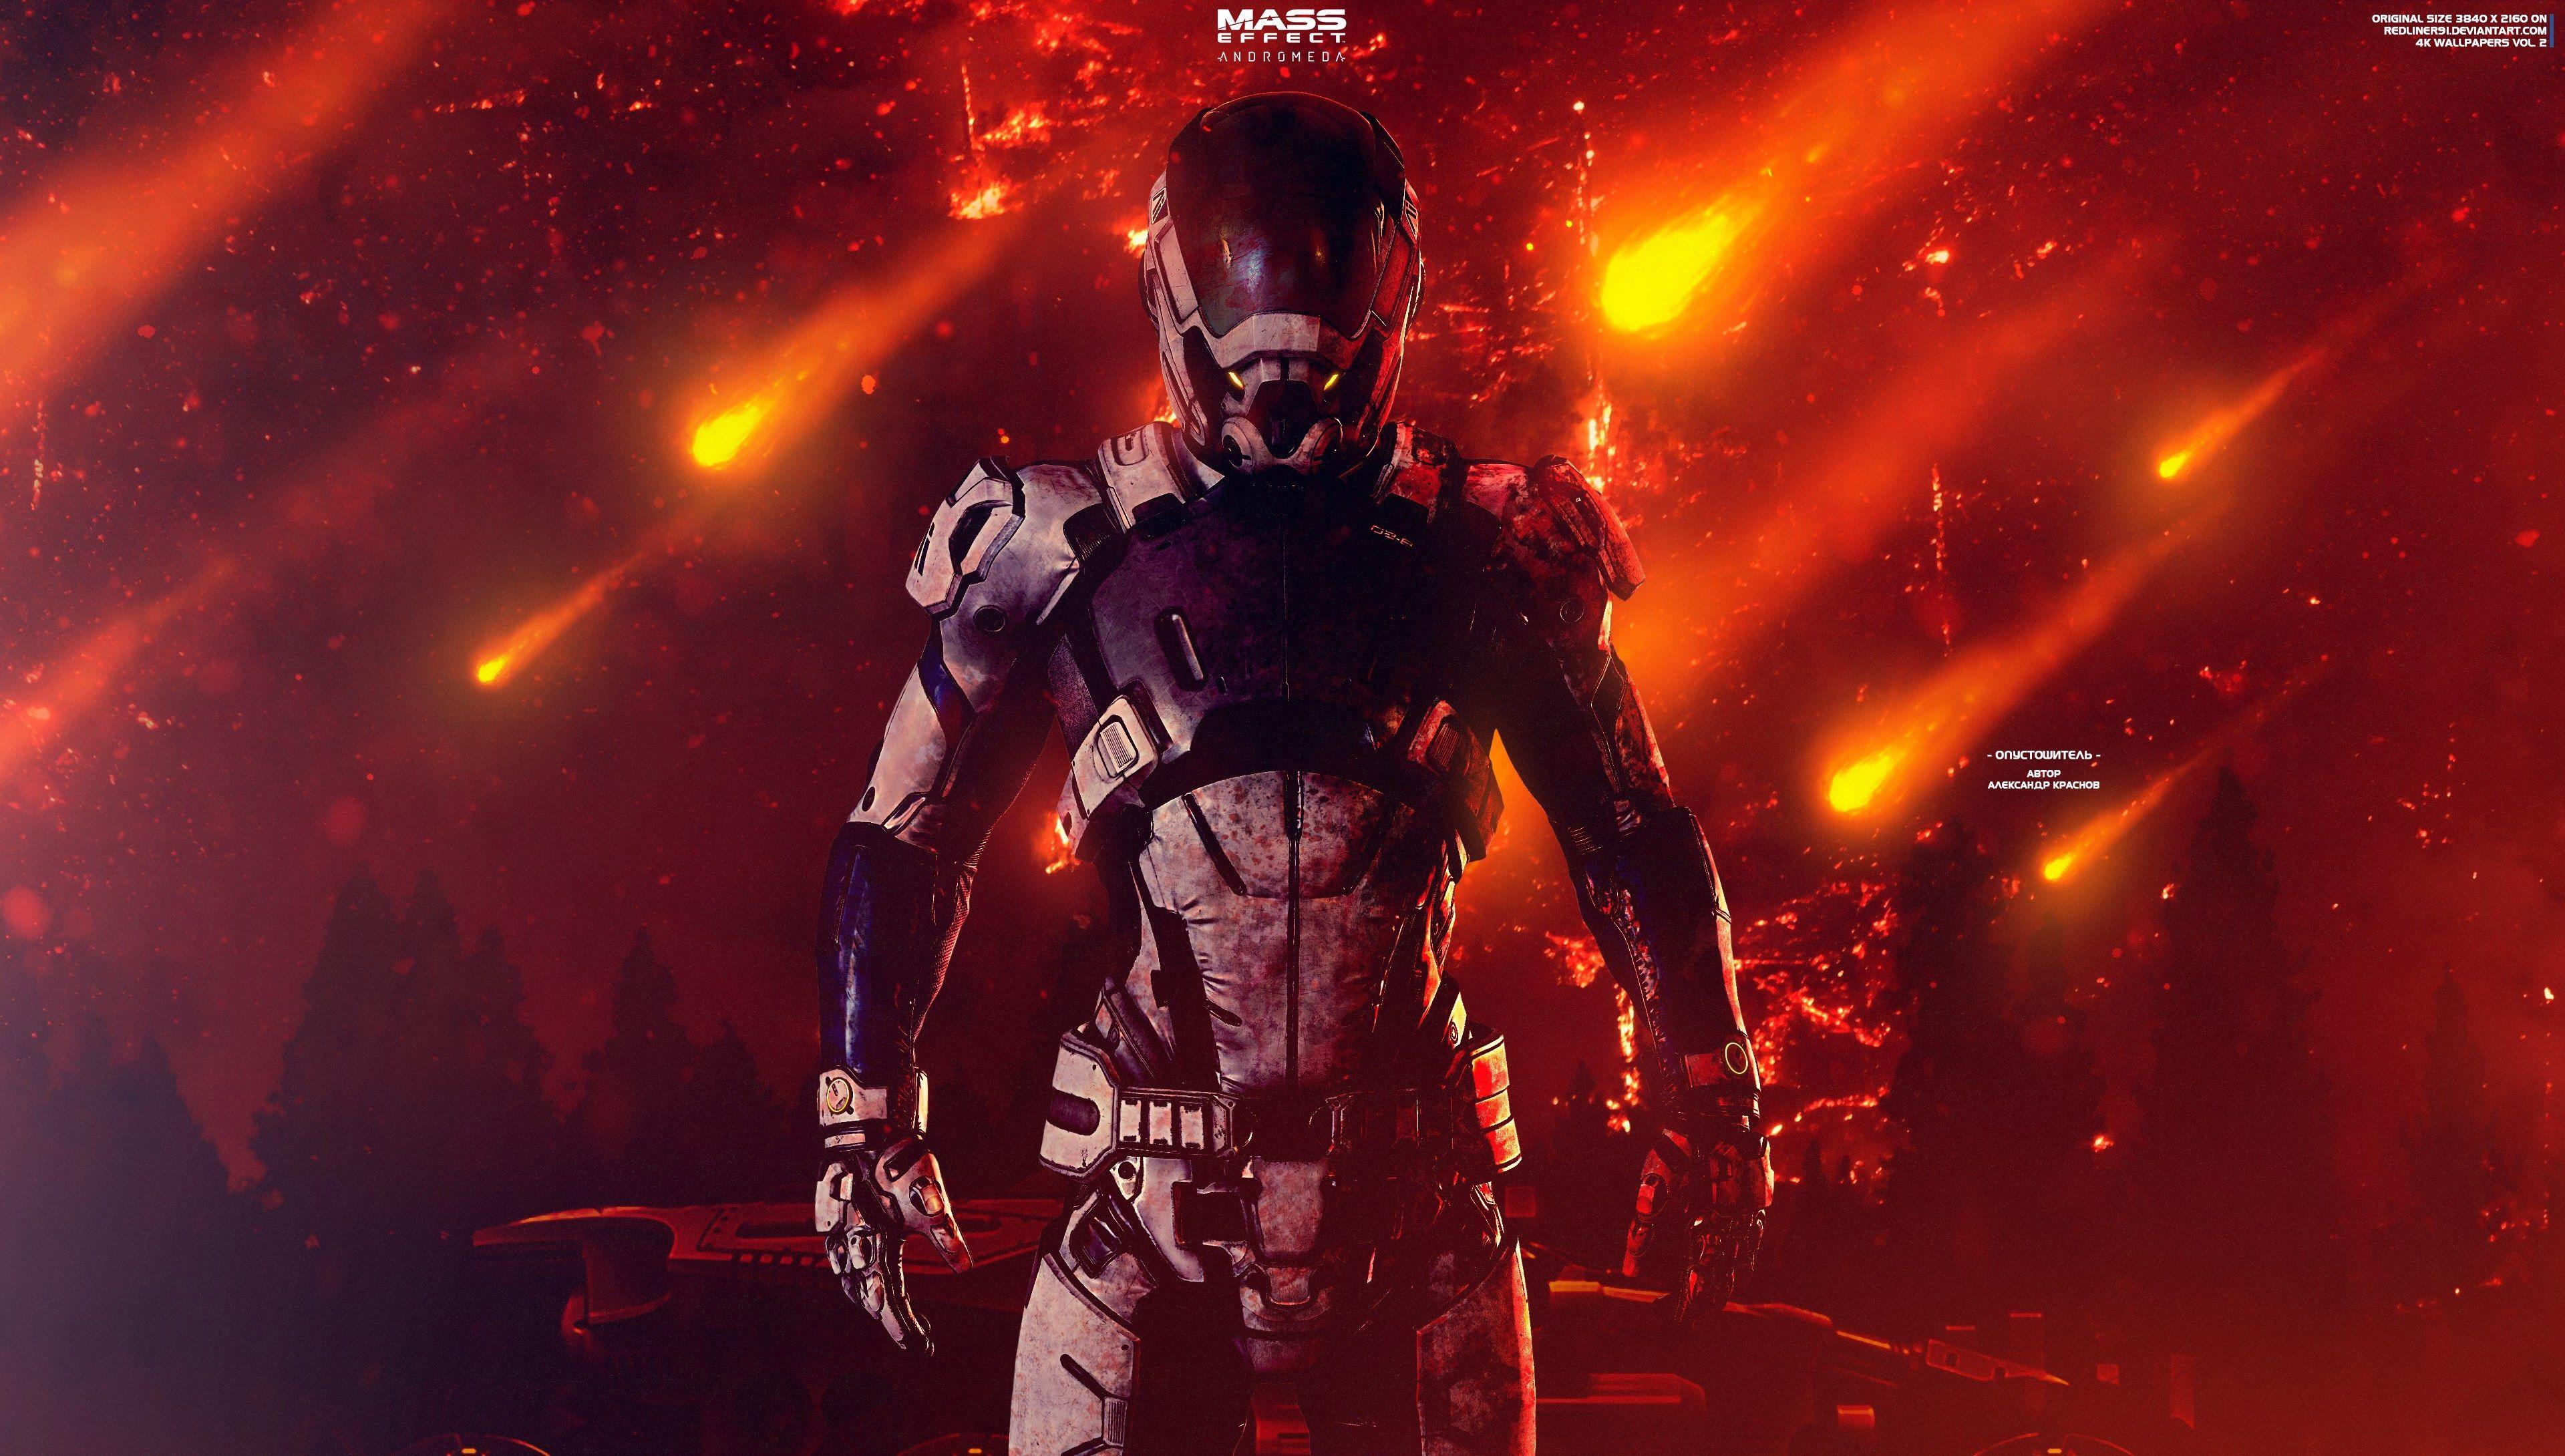 3840x2180 Mass Effect Andromeda 4k Hi Res Wallpaper Free Mass Effect Mass Mass Effect Universe